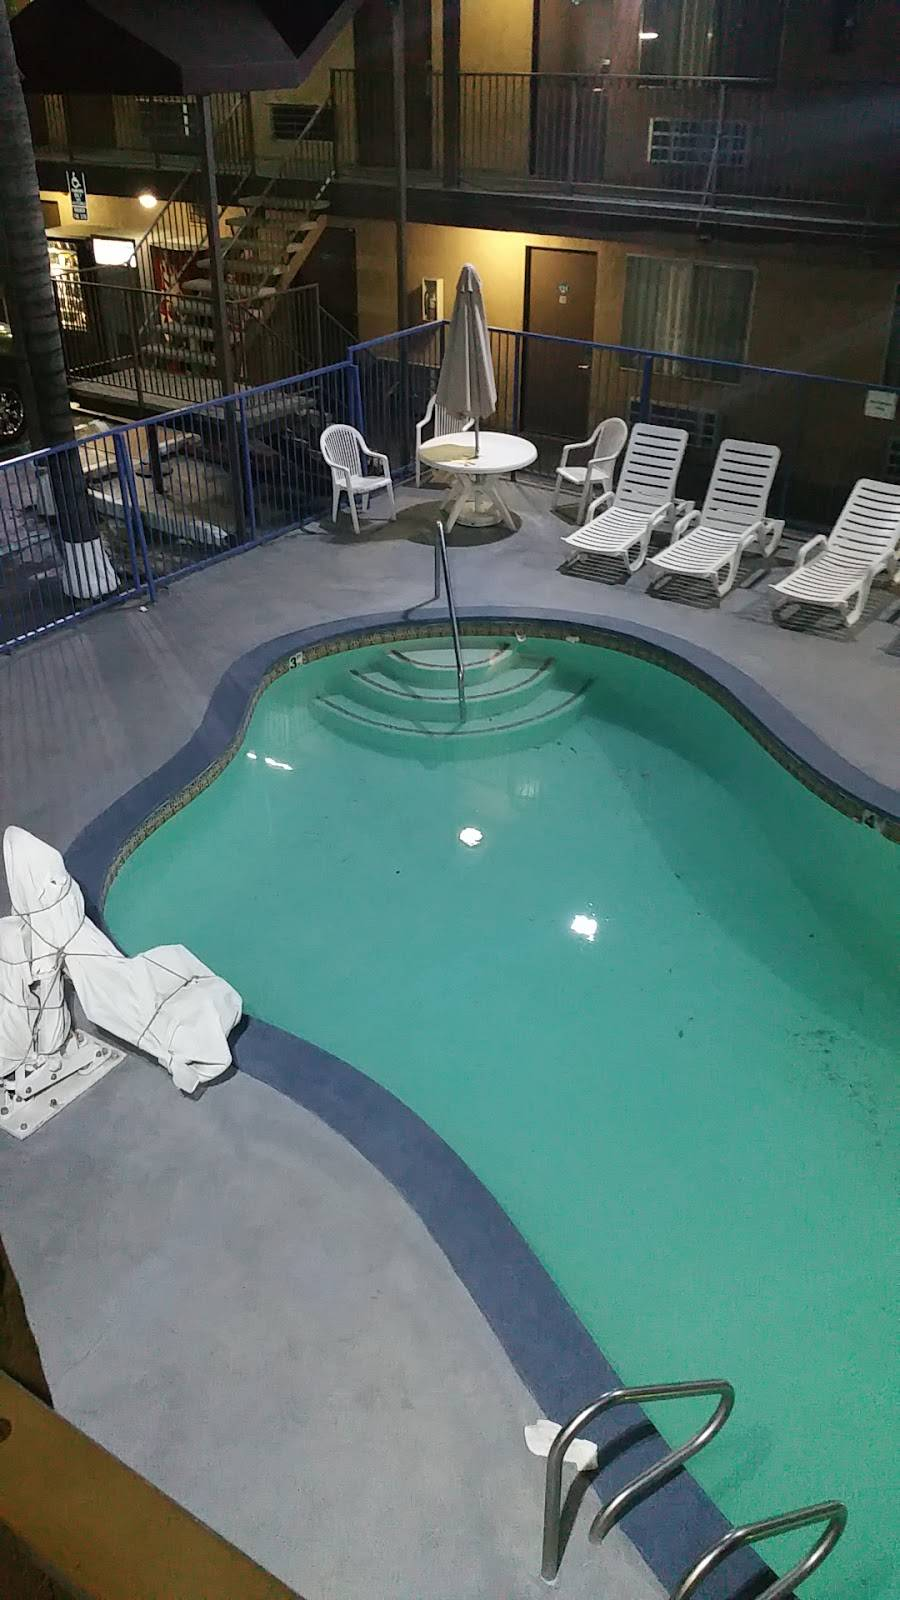 Days Inn by Wyndham San Bernardino - lodging  | Photo 3 of 8 | Address: 1386 E Highland Ave, San Bernardino, CA 92404, USA | Phone: (909) 881-1702